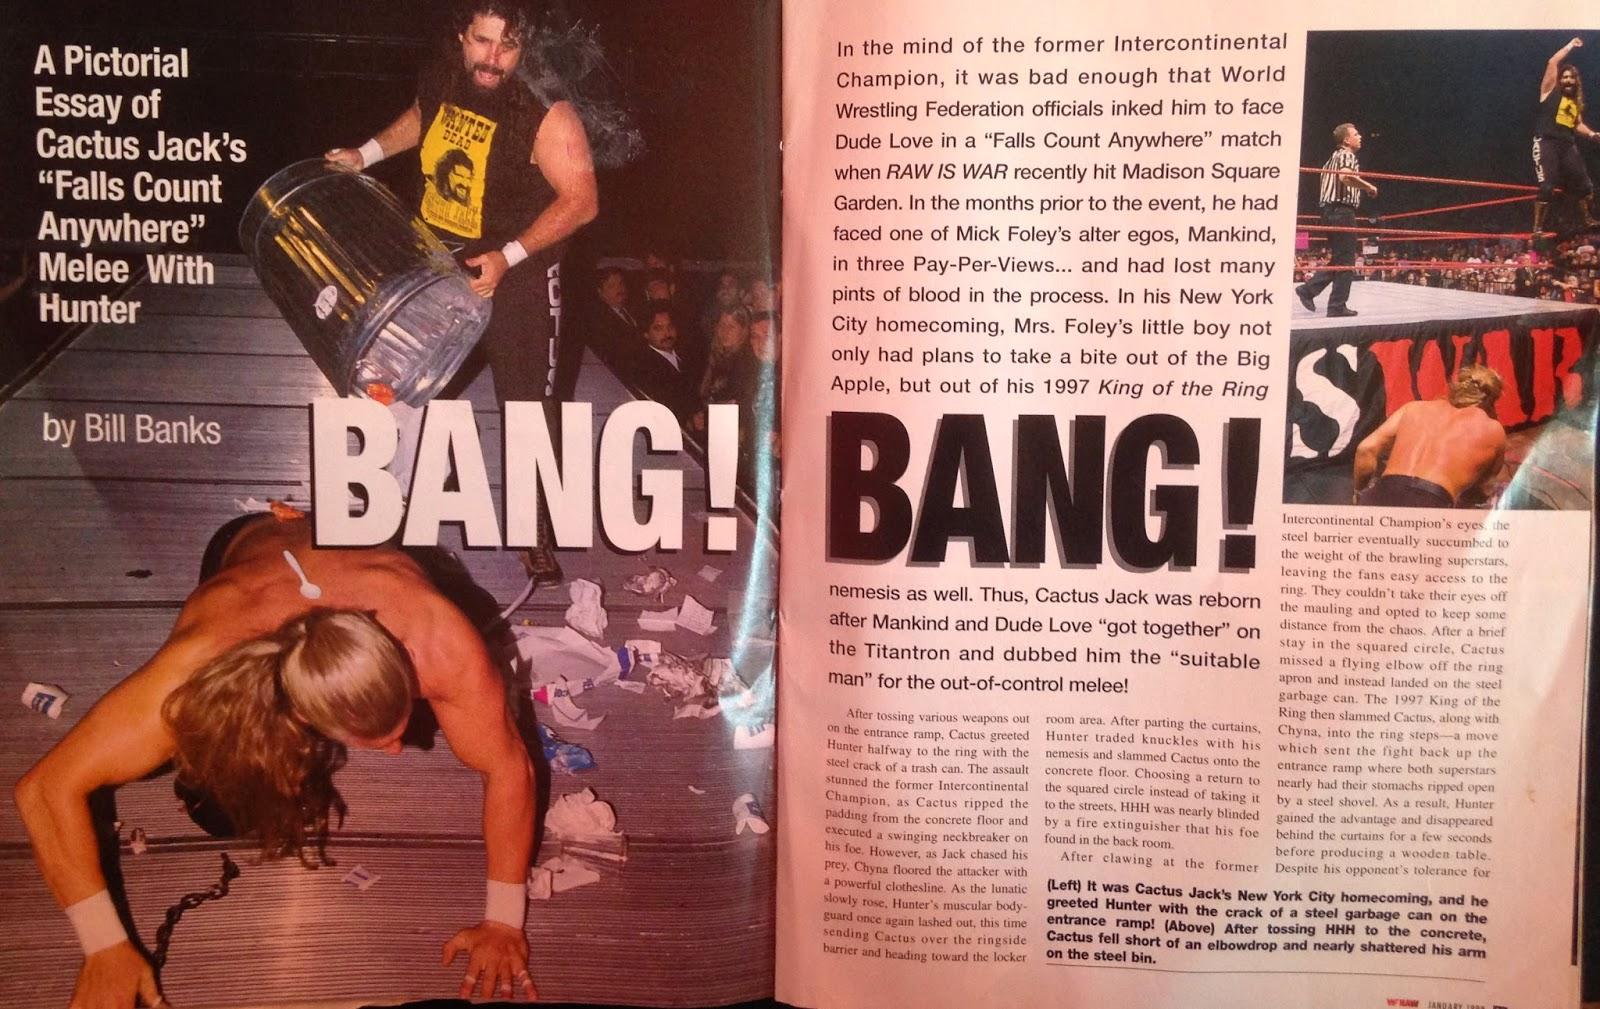 WWE: WWF RAW MAGAZINE - January 1998 - Triple H vs. Cactus Jack pictorial